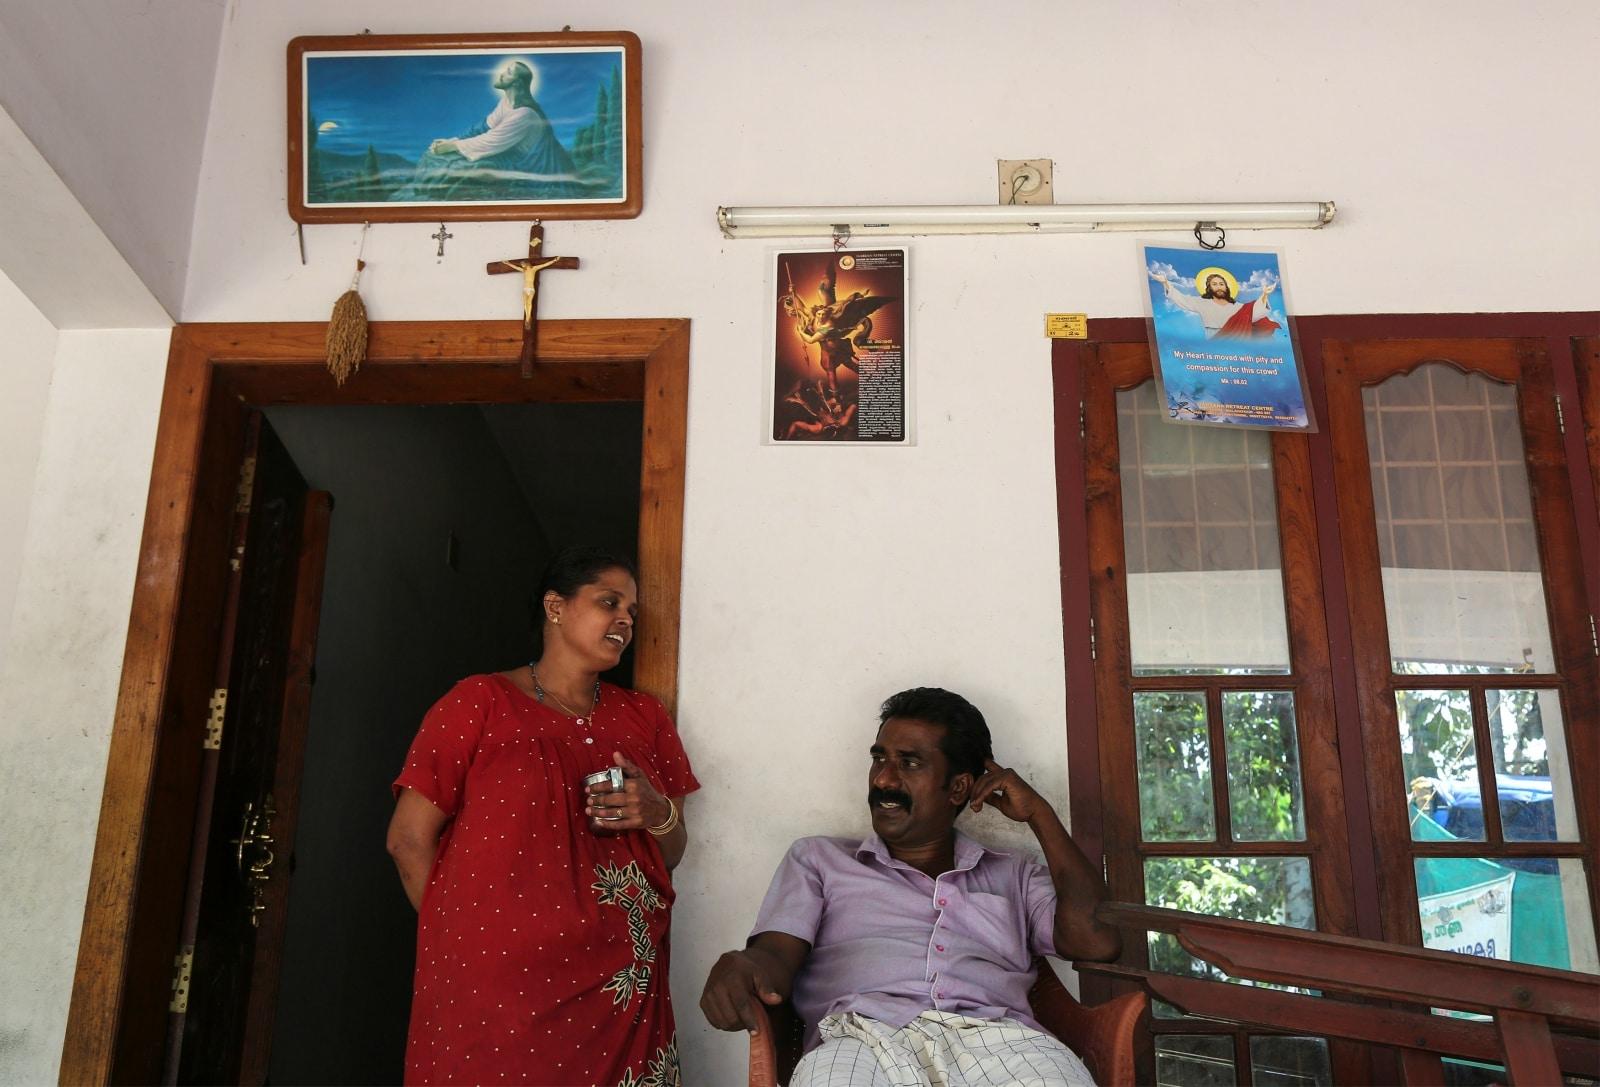 Farmer, Joby Pathrose speaks to his wife Kavitha at their house in Okkal village in Ernakulam, Kerala, India. September 25, 2018. REUTERS/Sivaram V